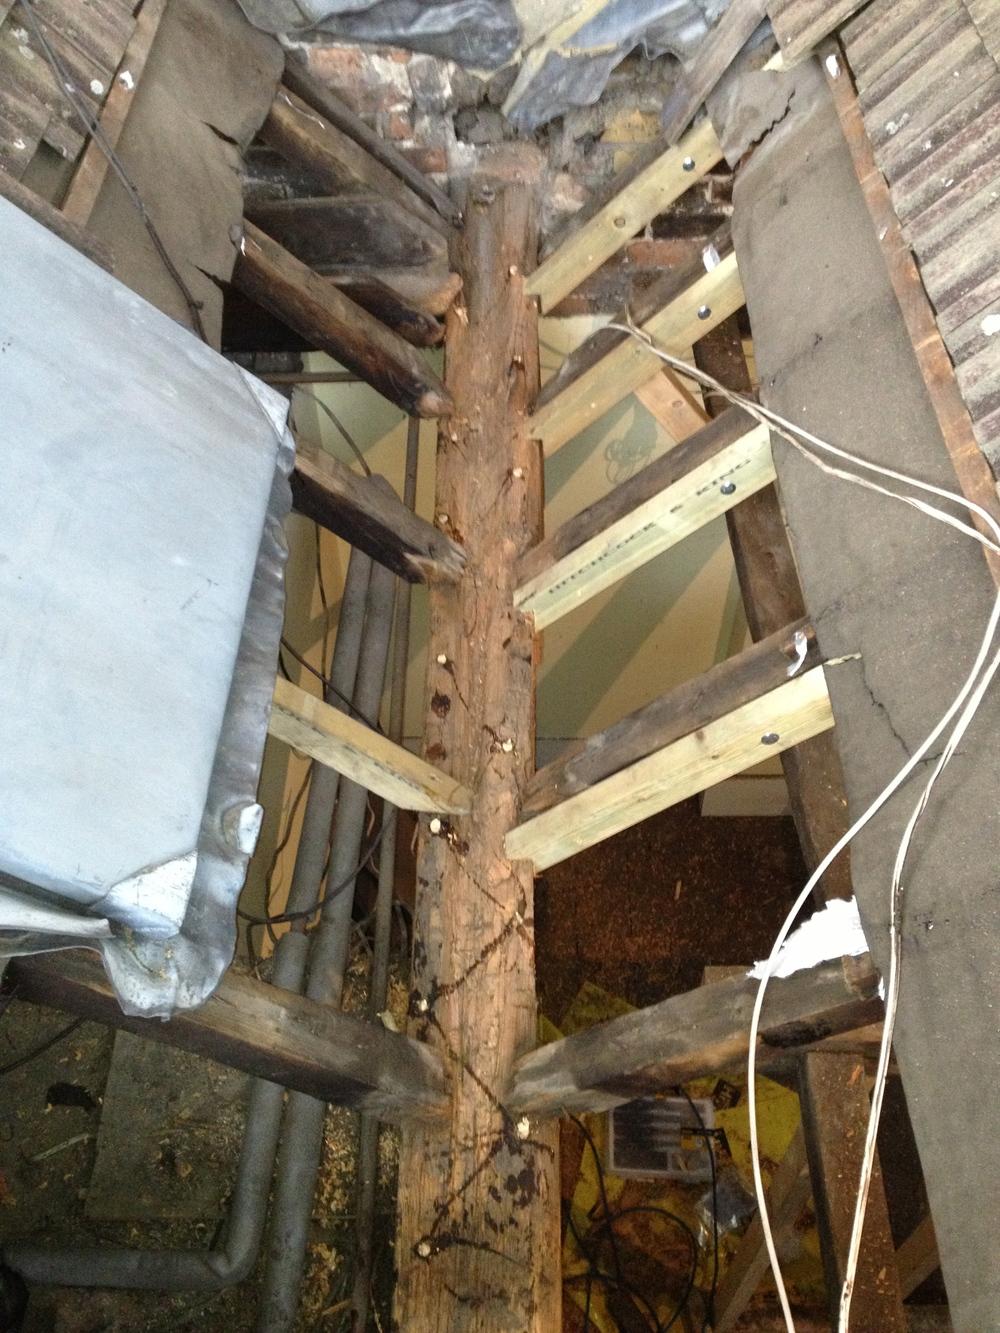 Boron rod treatment to wet rot.